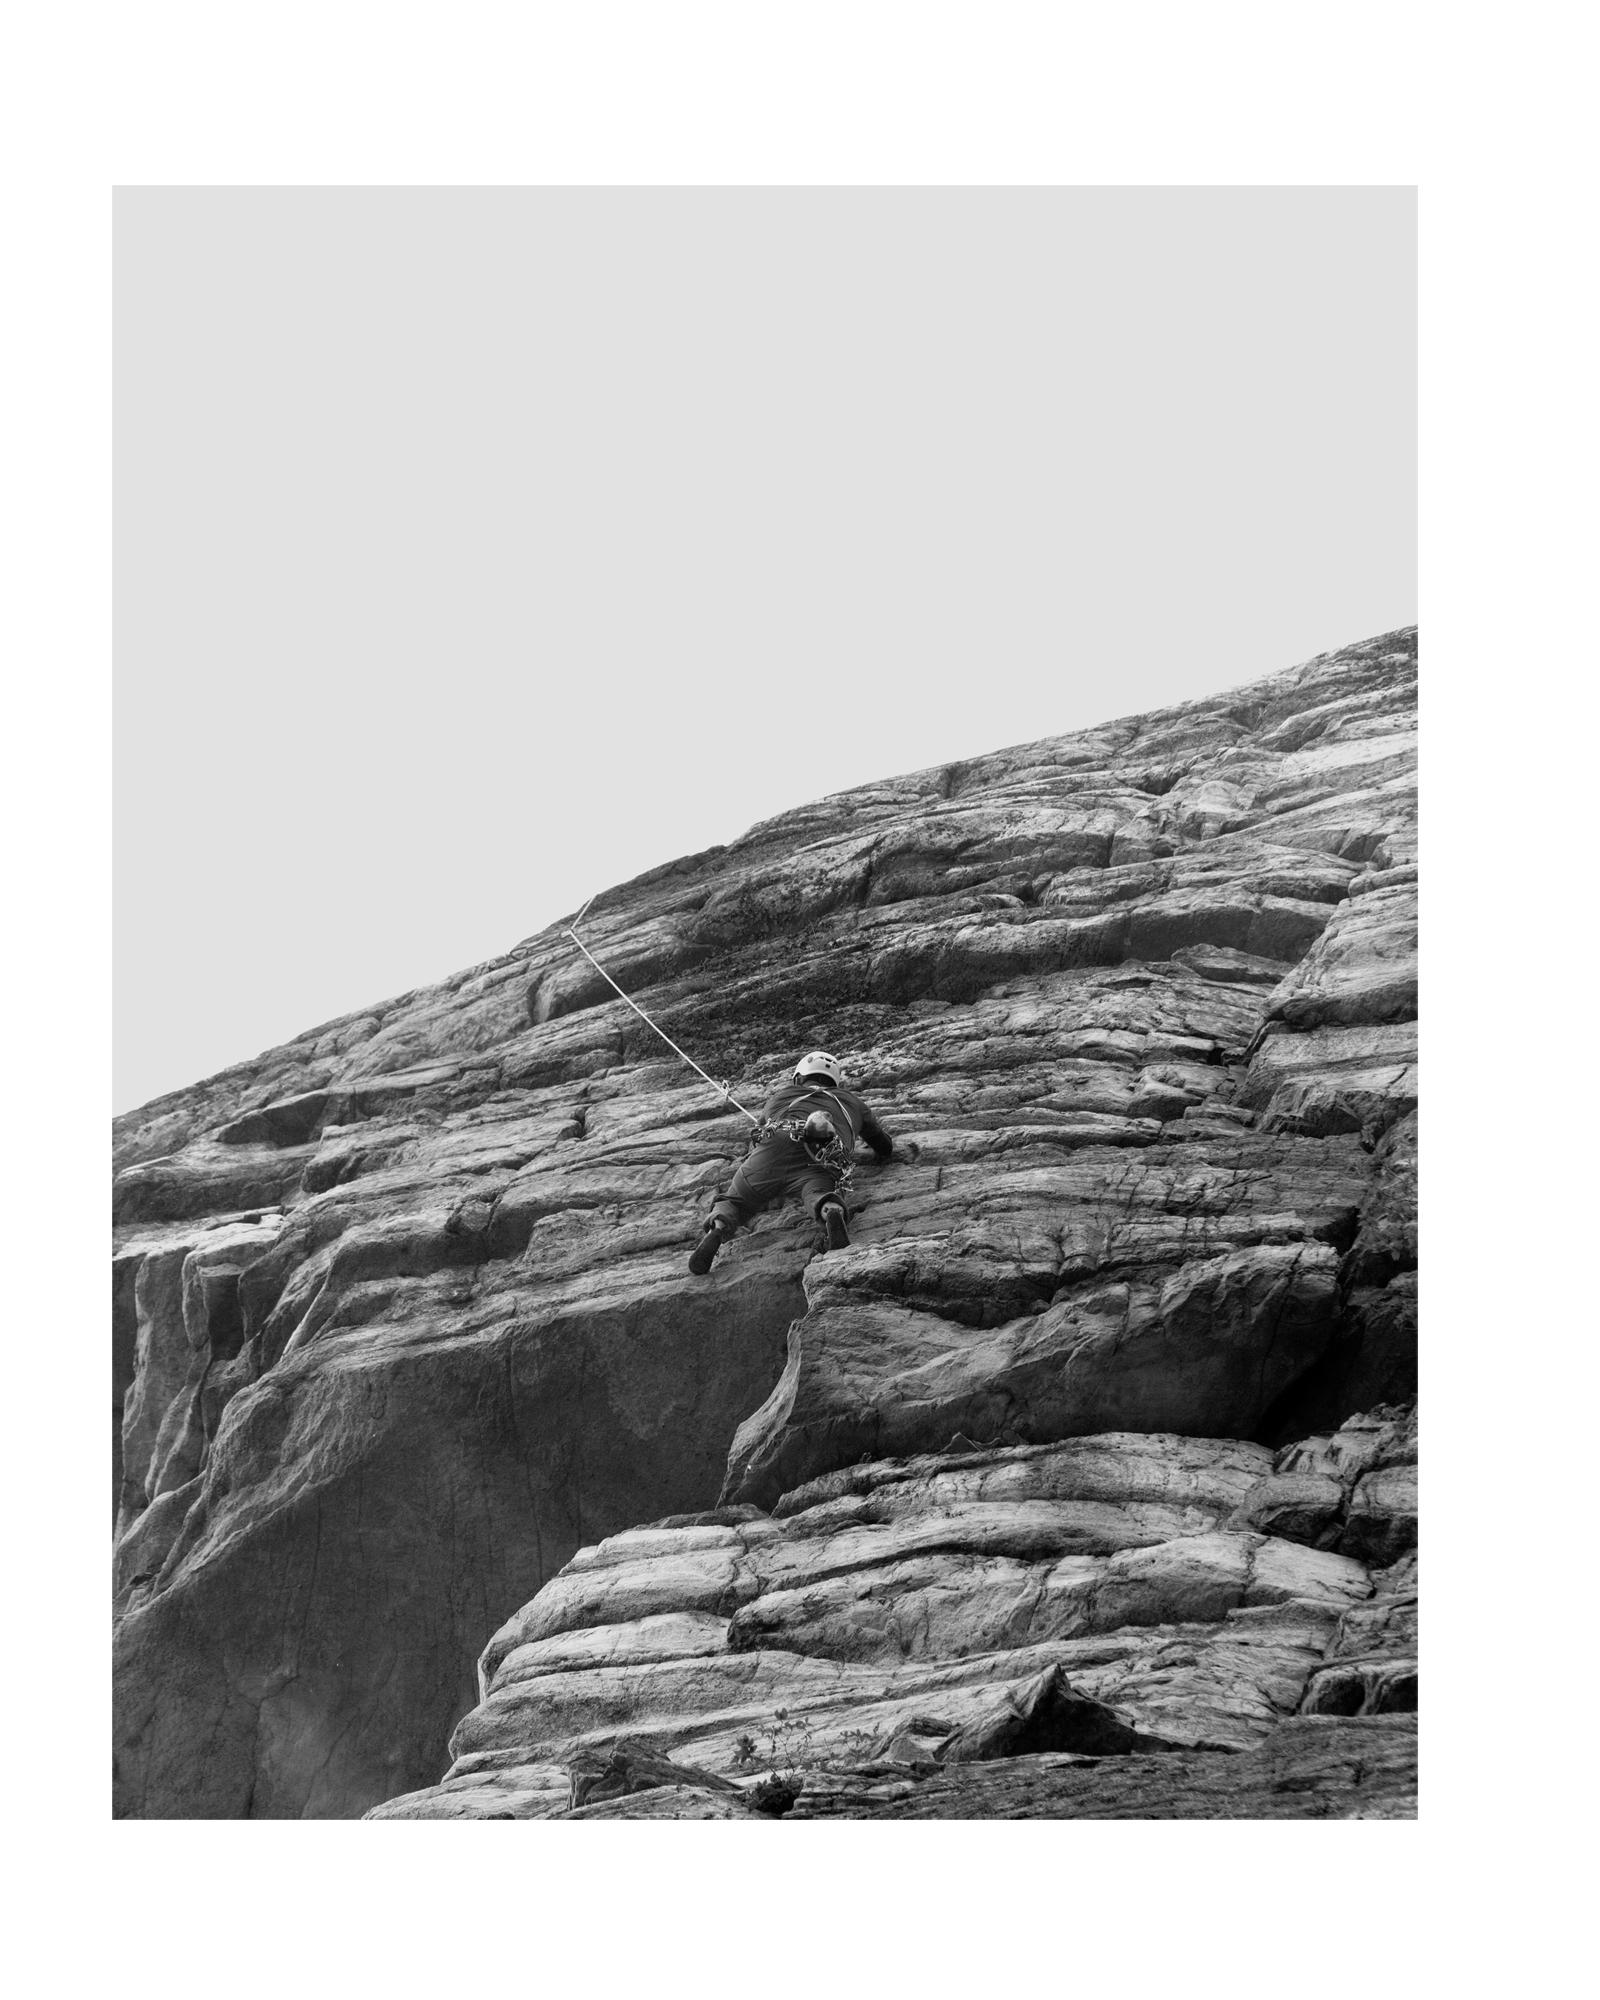 Untitled-1(5)x.jpg